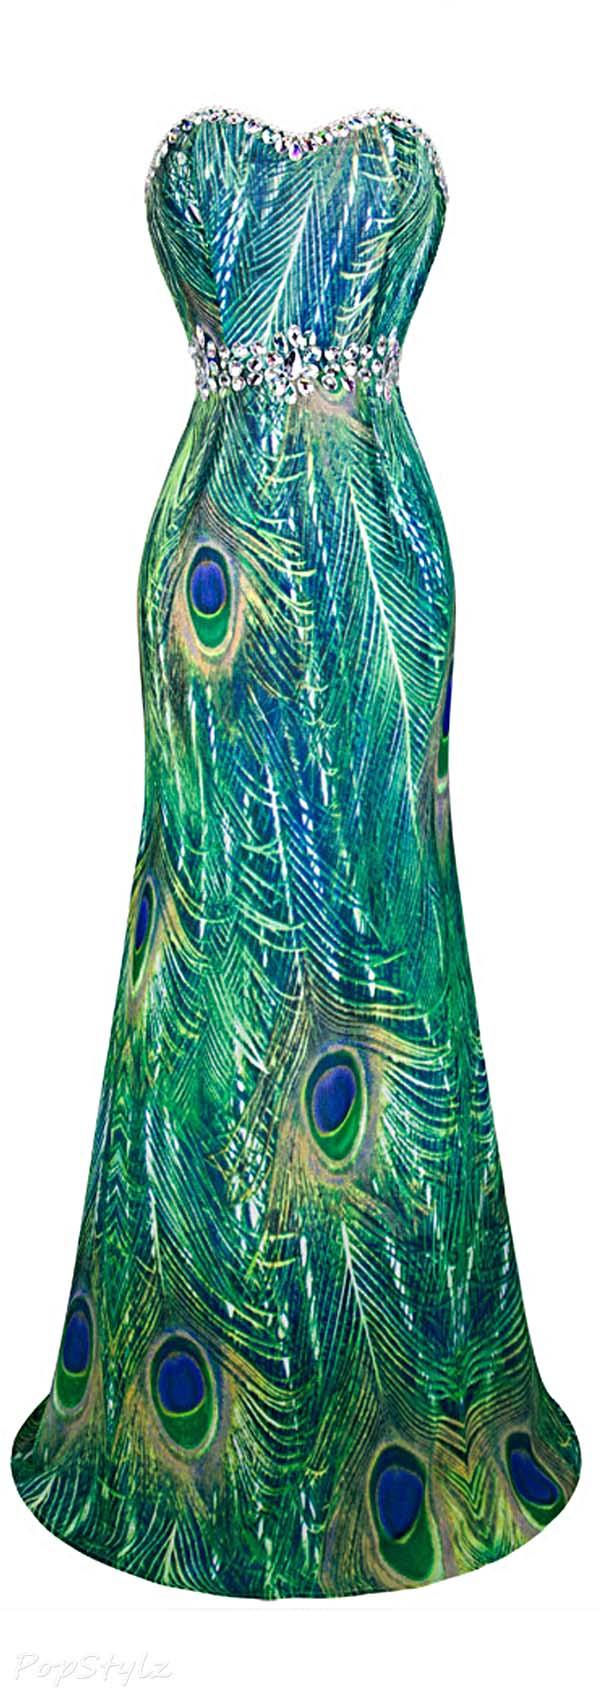 Angel-fashions Rhinestone Peacock Evening Dress